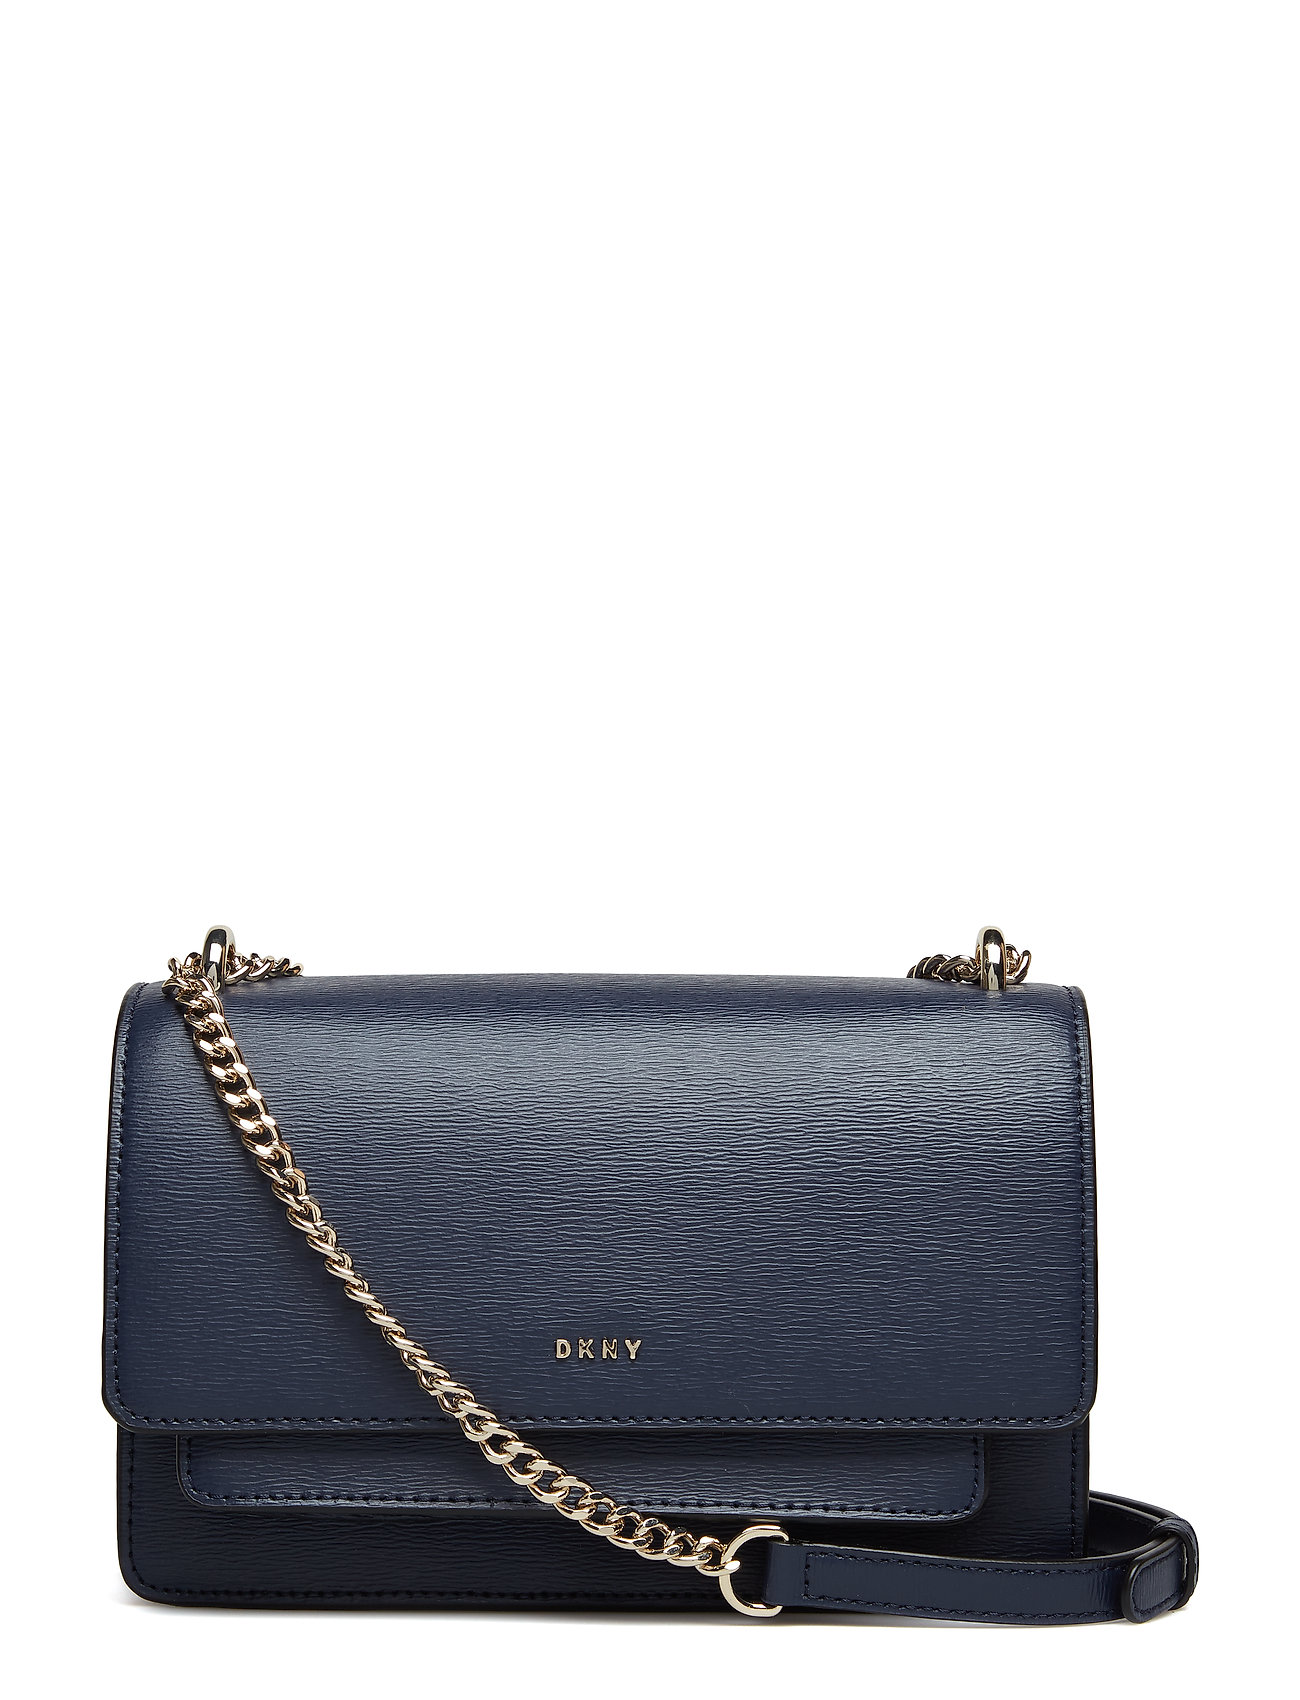 DKNY Bryant Park Bags Small Shoulder Bags/crossbody Bags Blau DKNY BAGS